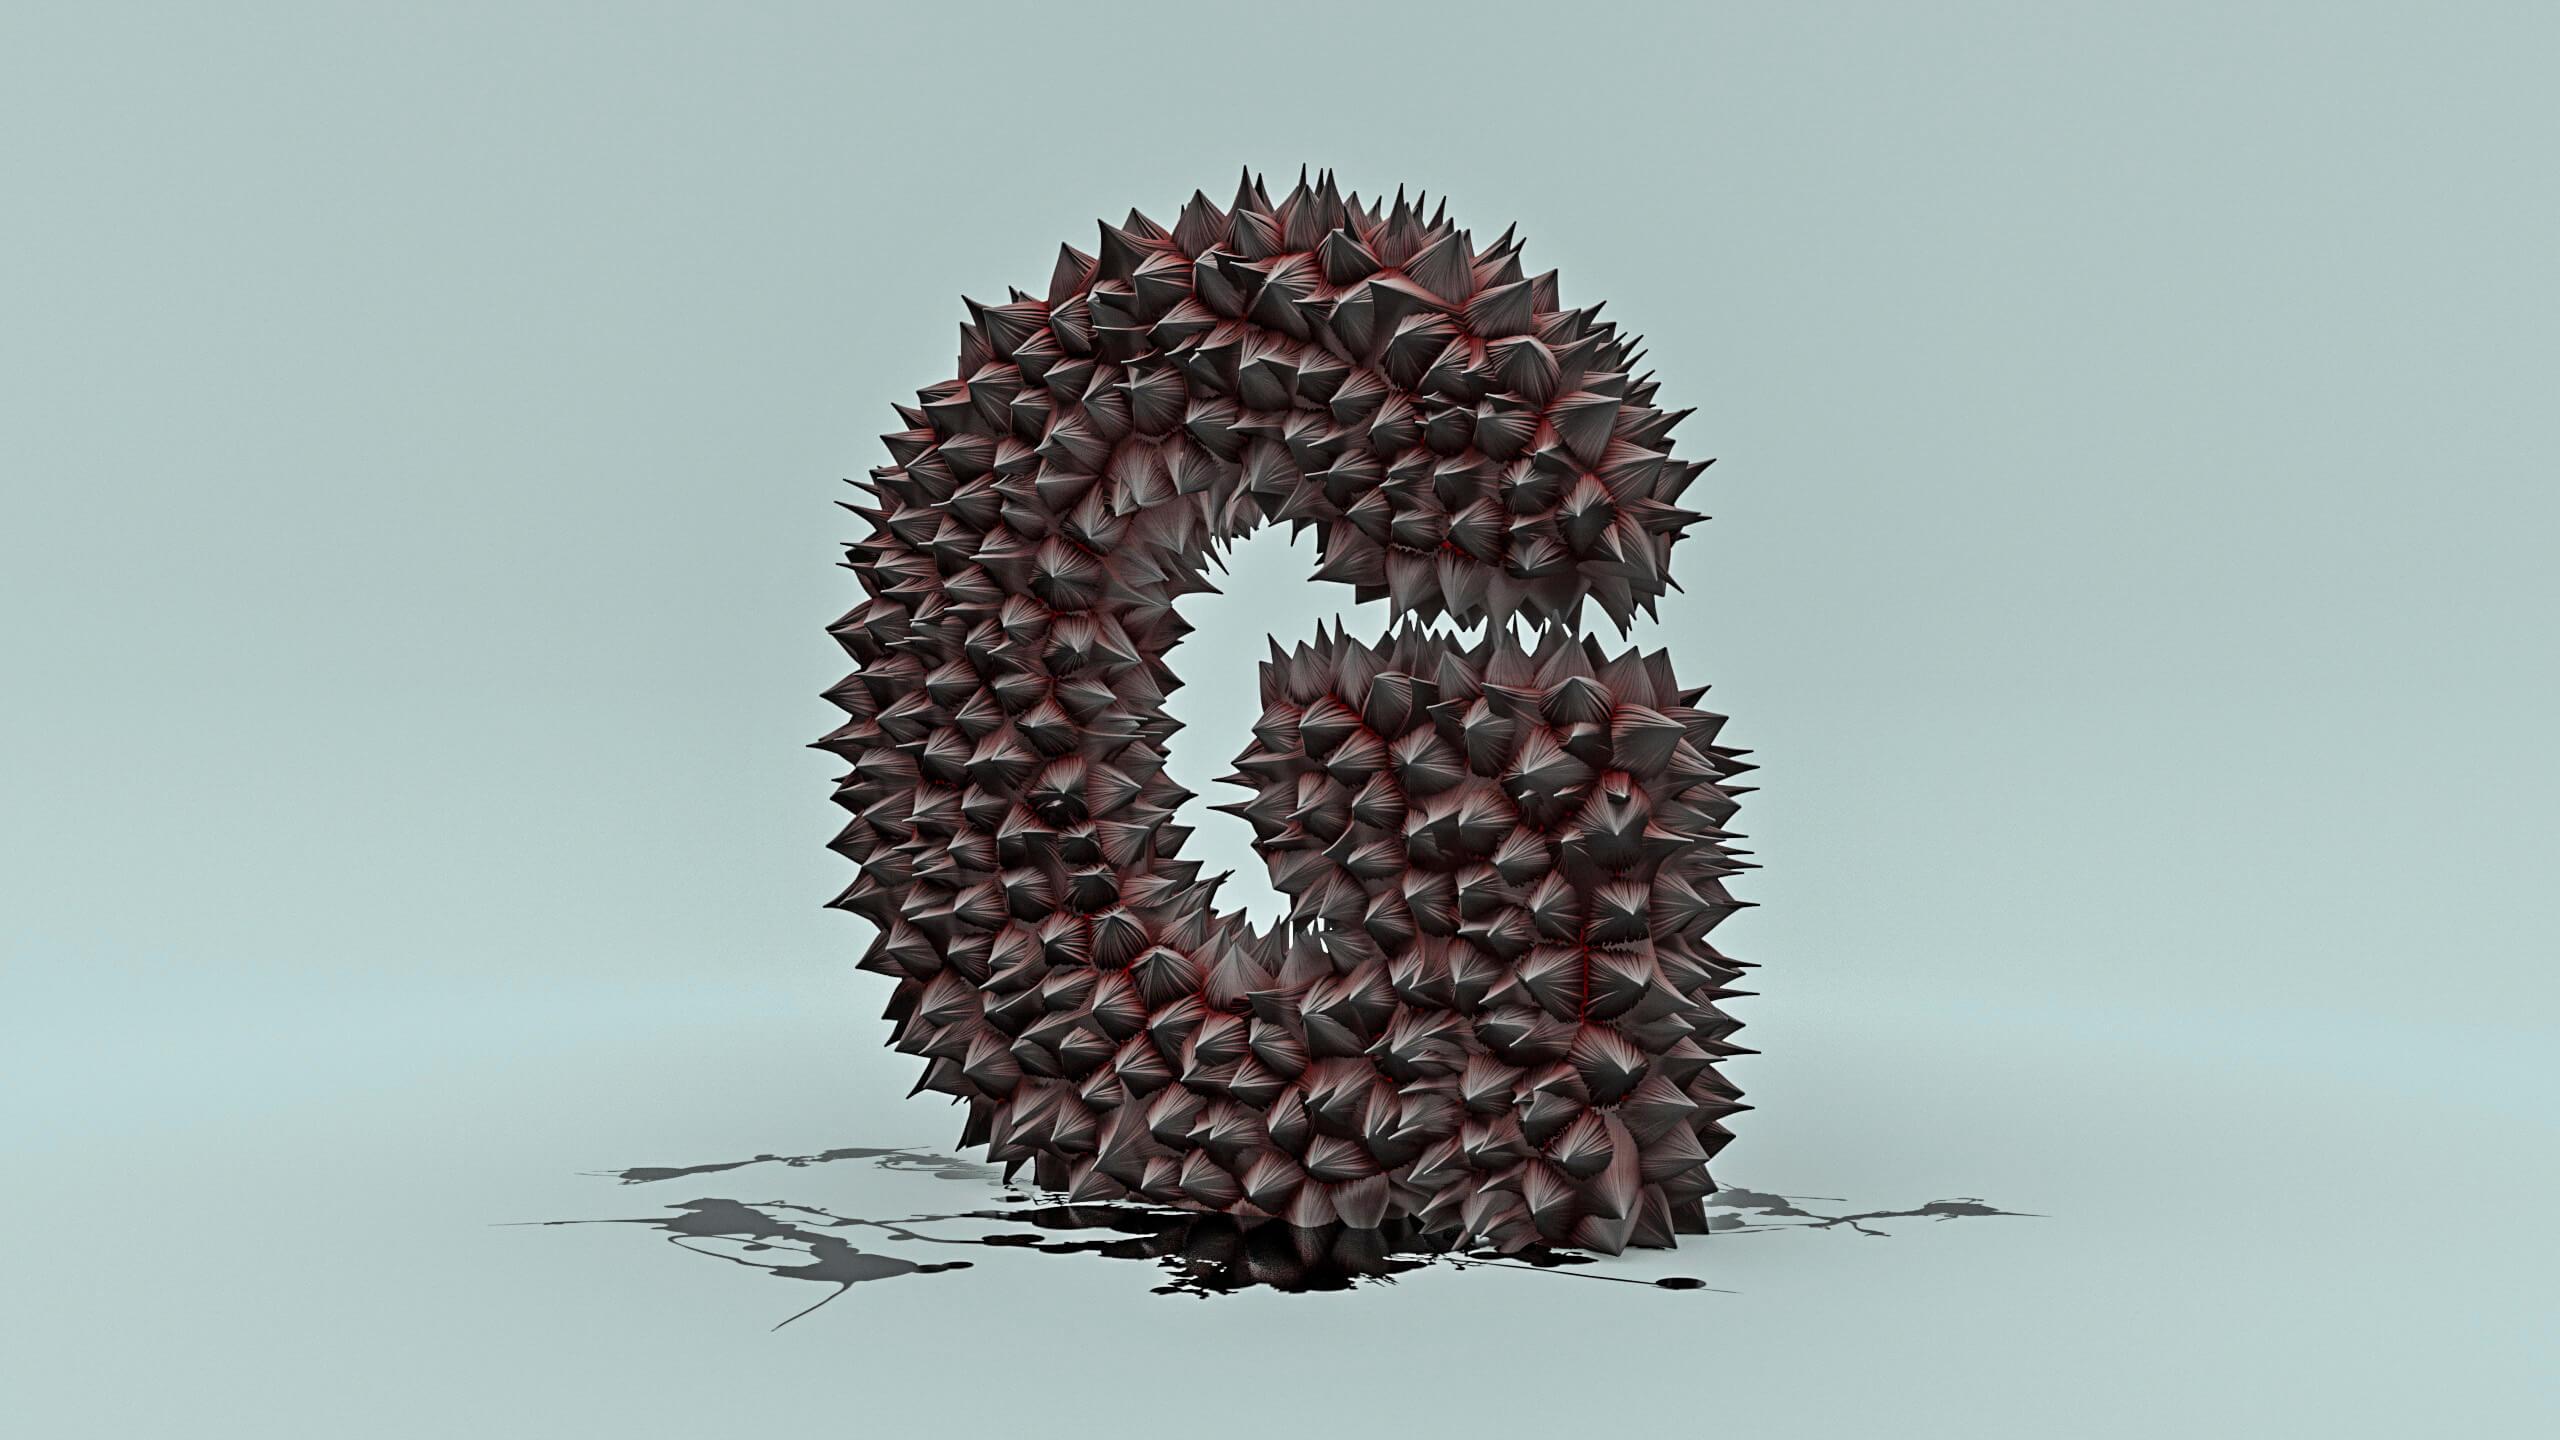 Buchstabe G symbolhaft umgesetzt